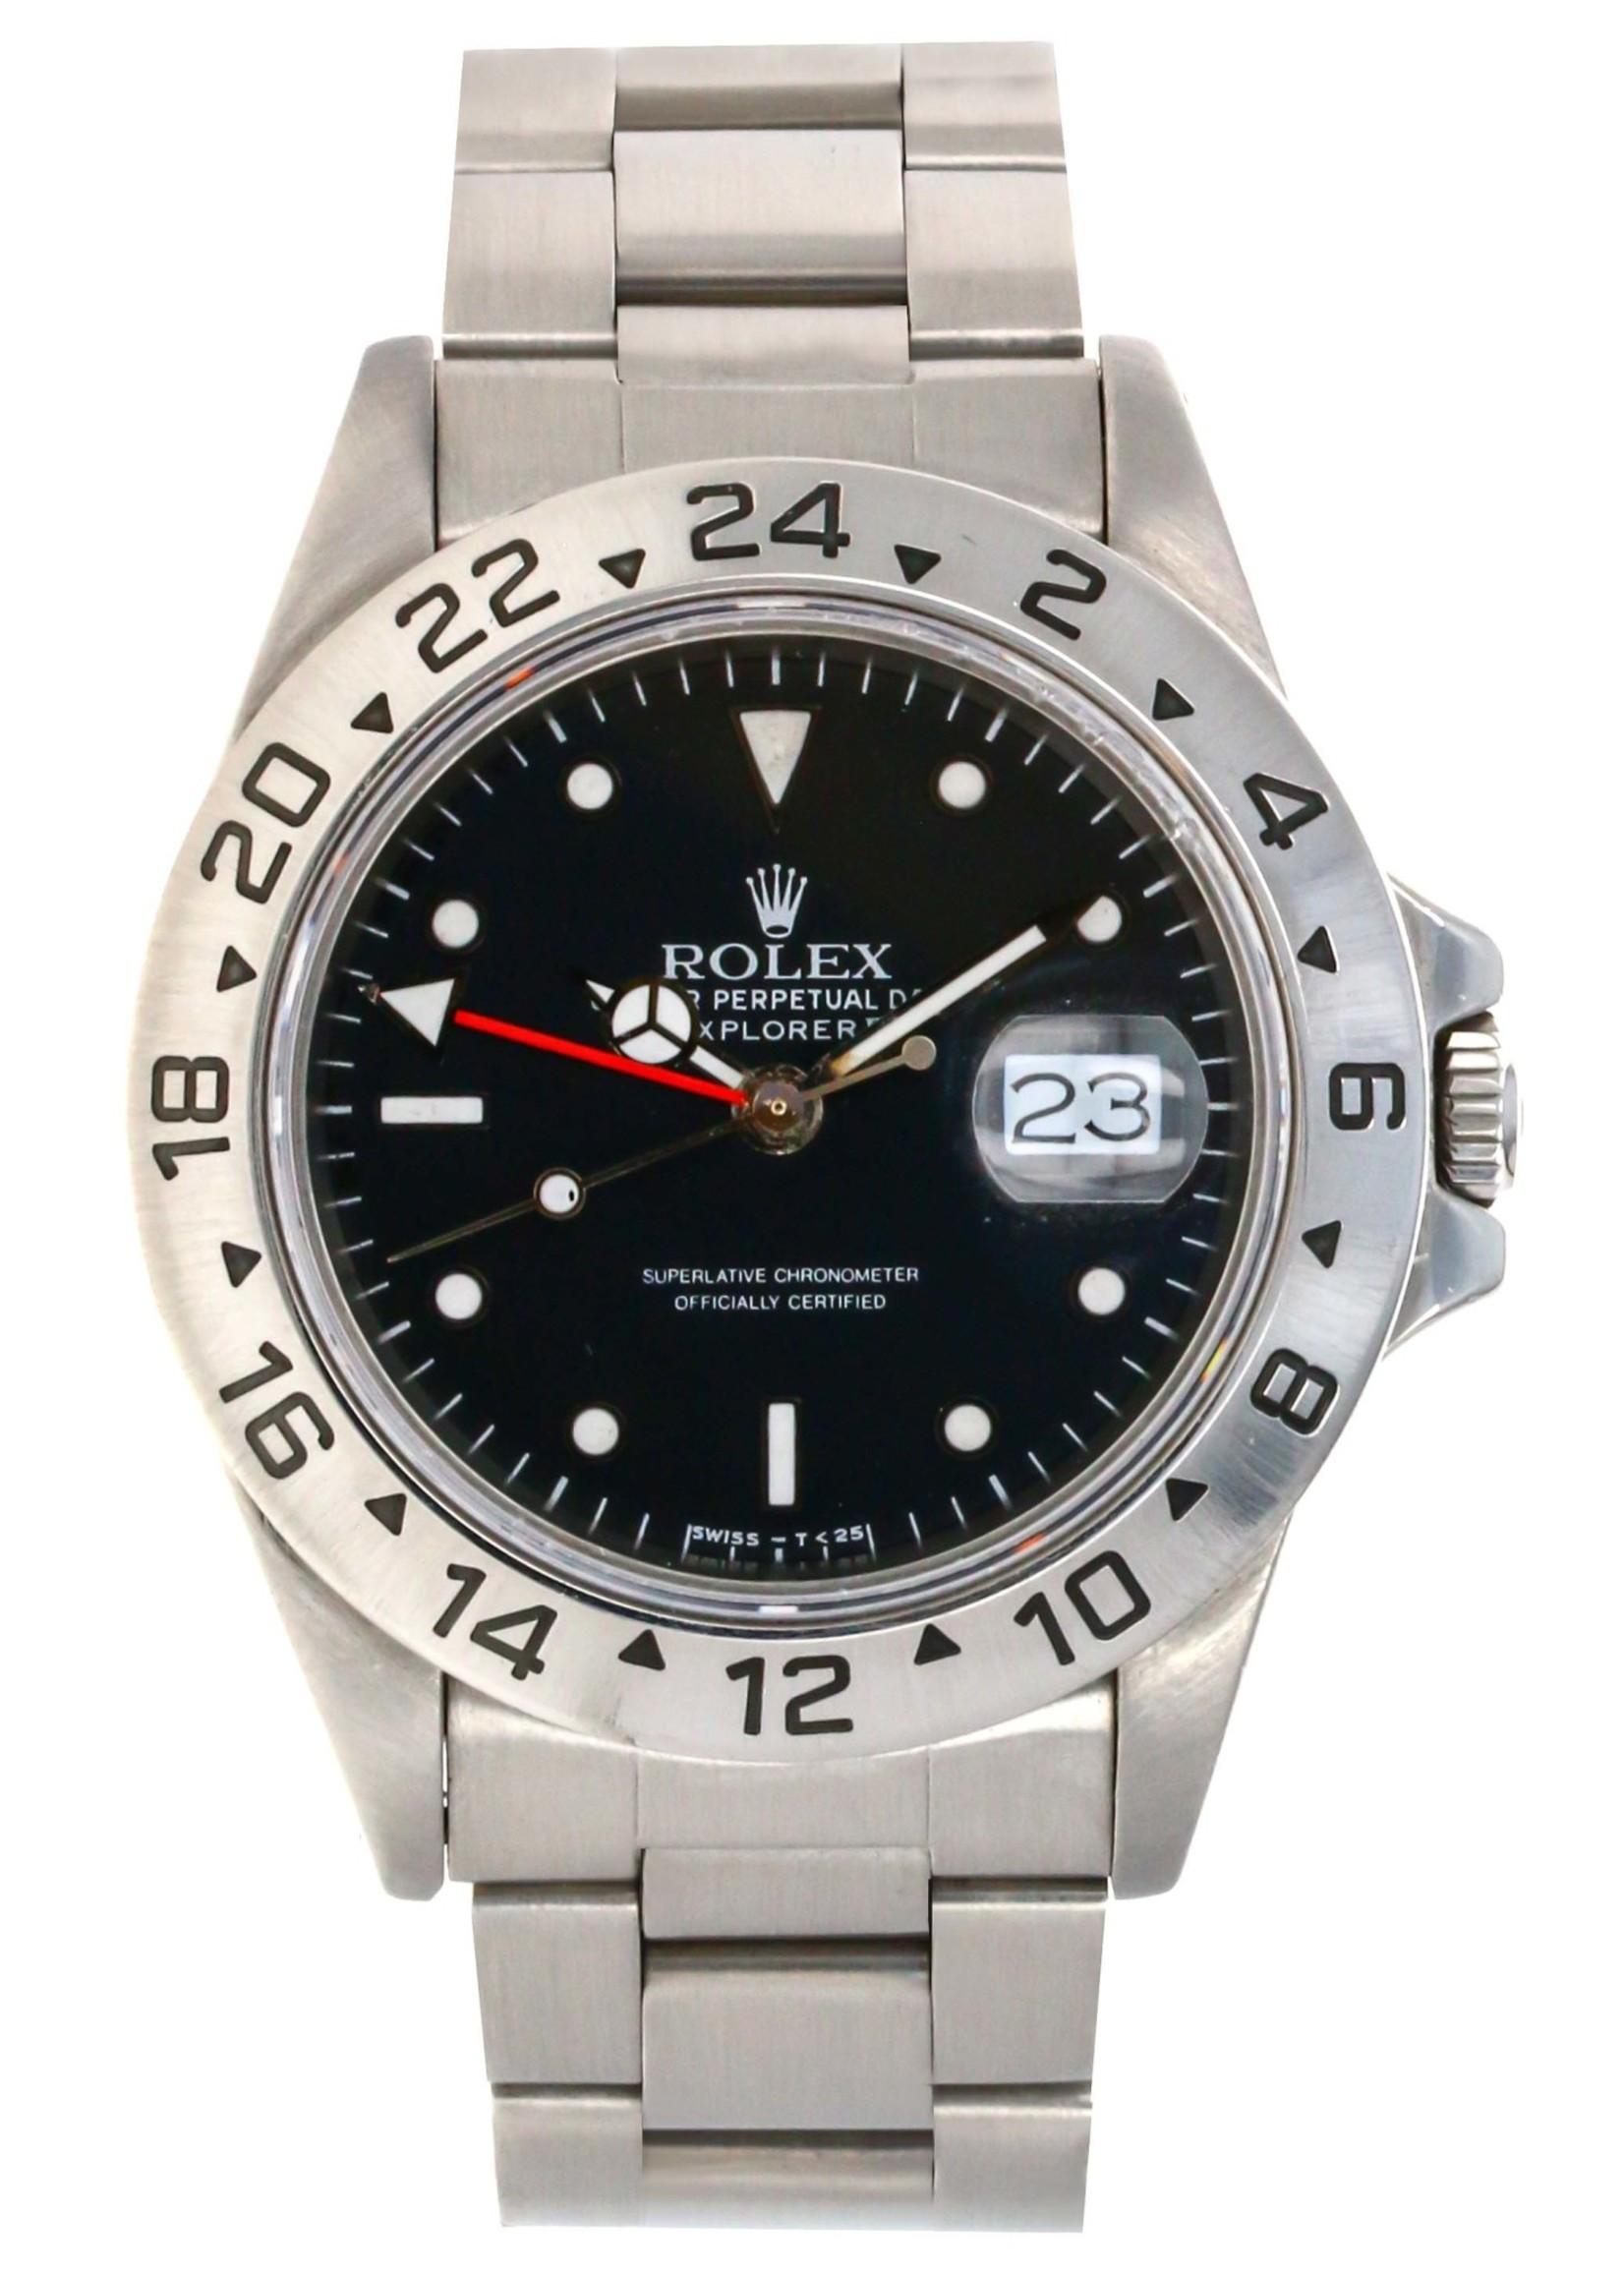 Rolex ROLEX EXPLORER II (1985) #16550  ROLEX SERVICE HANDS - AFTERMARKET DIAL